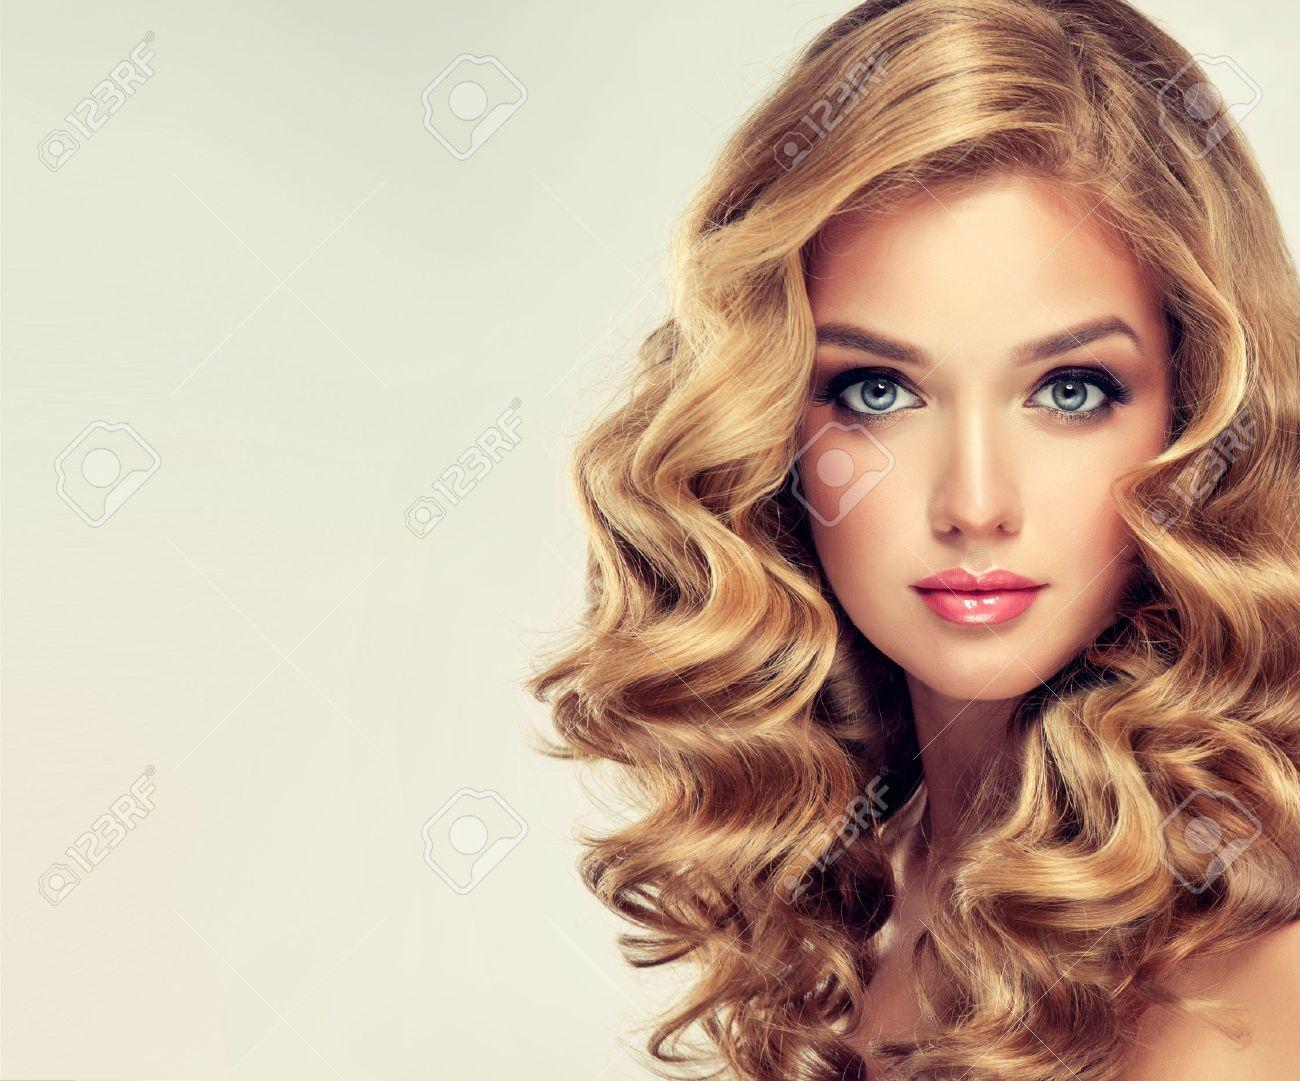 el pelo con un peinado elegante pelo ondulado rizado peinado